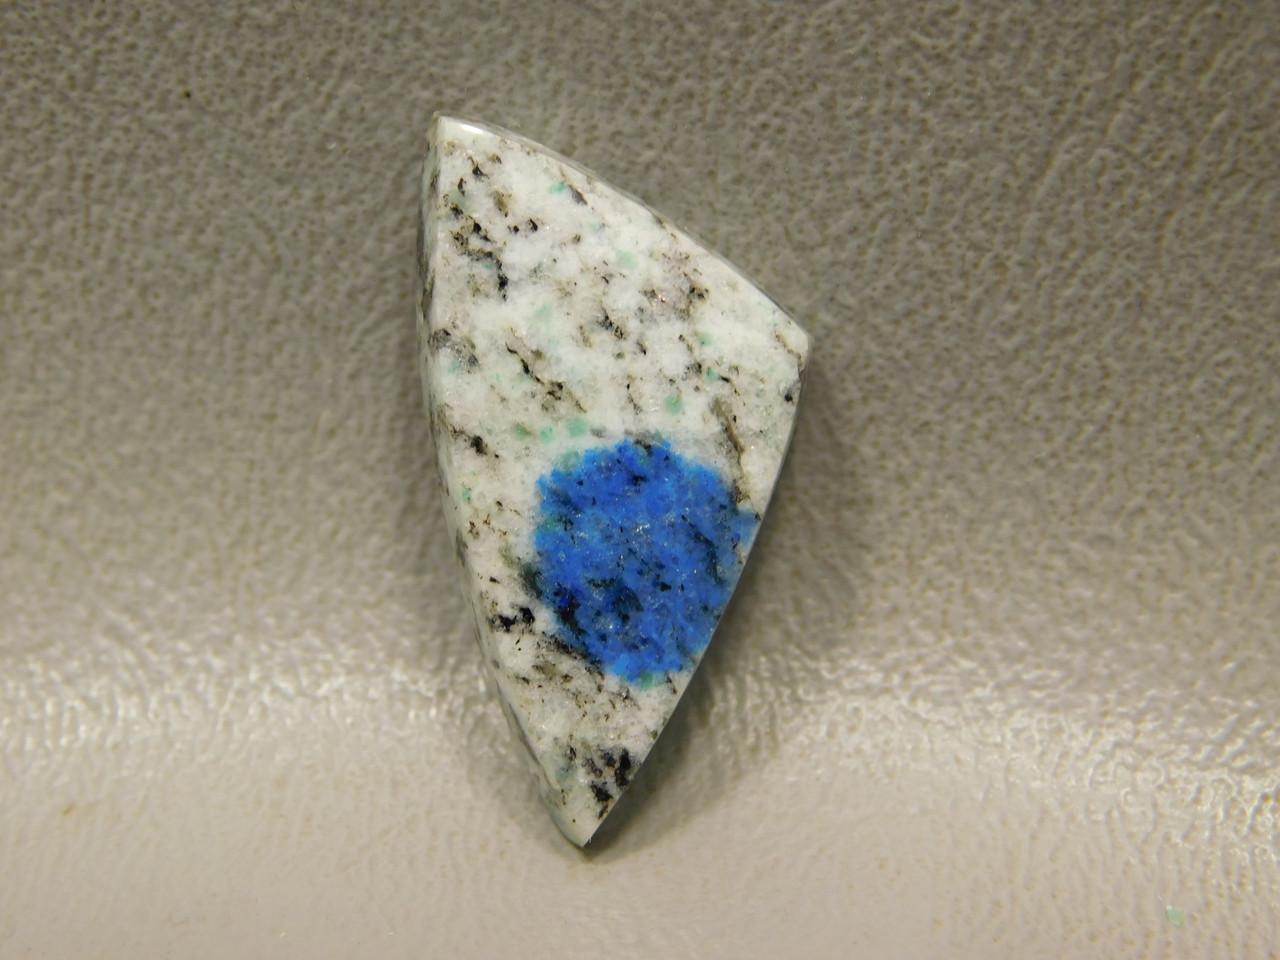 K2 Azurite Blue Dot Granite Jasper Jewelry Cabochon Stone #5